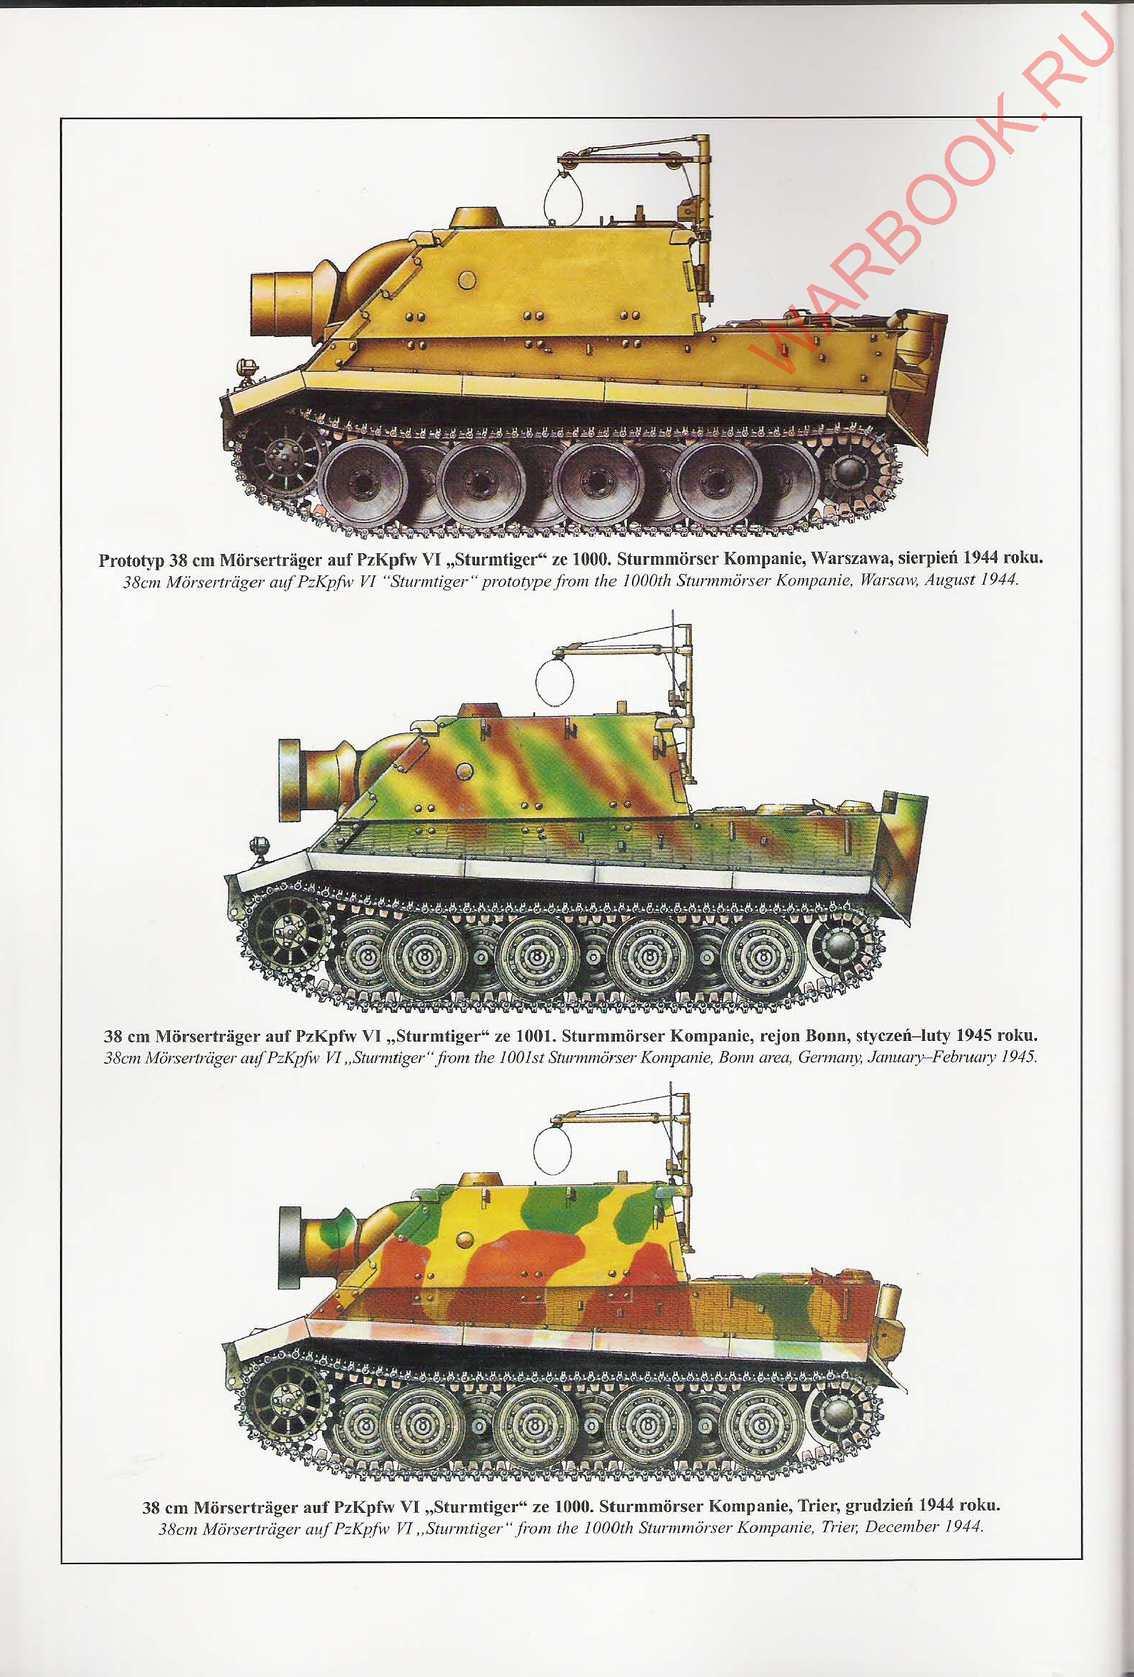 Wydawnictwo Militaria 293 Sturmtiger Maus Calameo Downloader